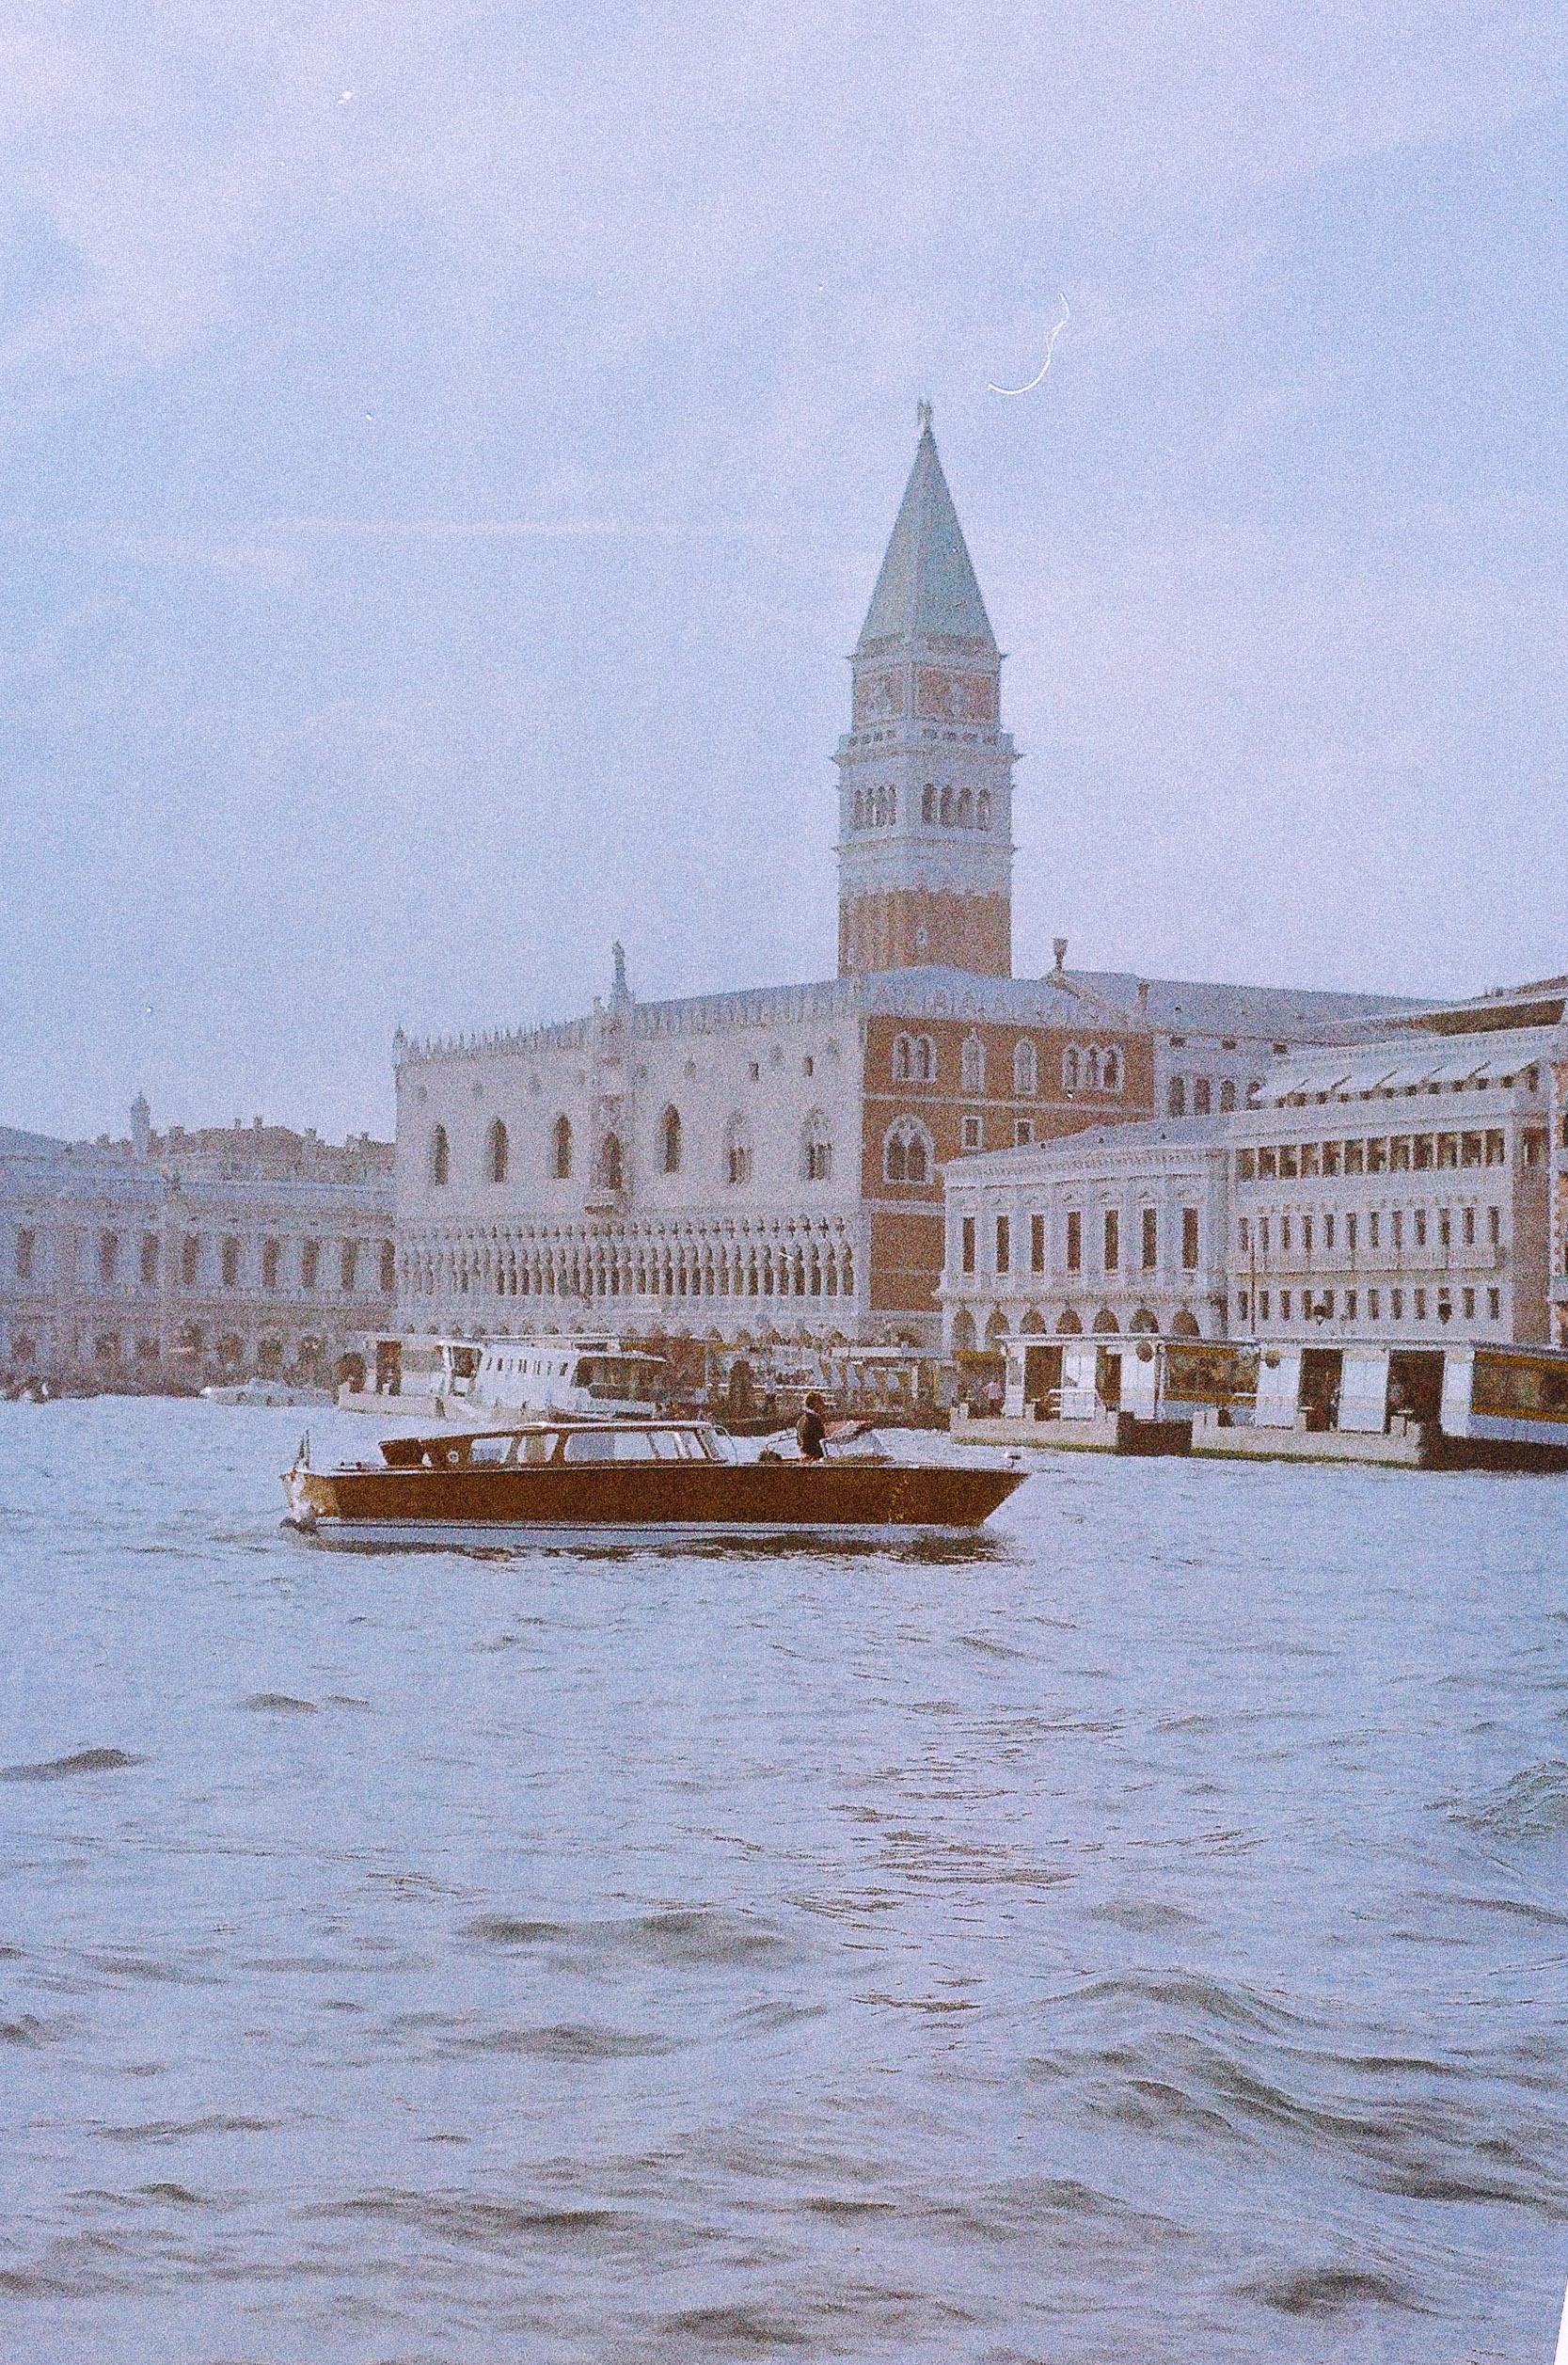 Lesly Lotha_Venice_Italy_Film Photography 05.jpg